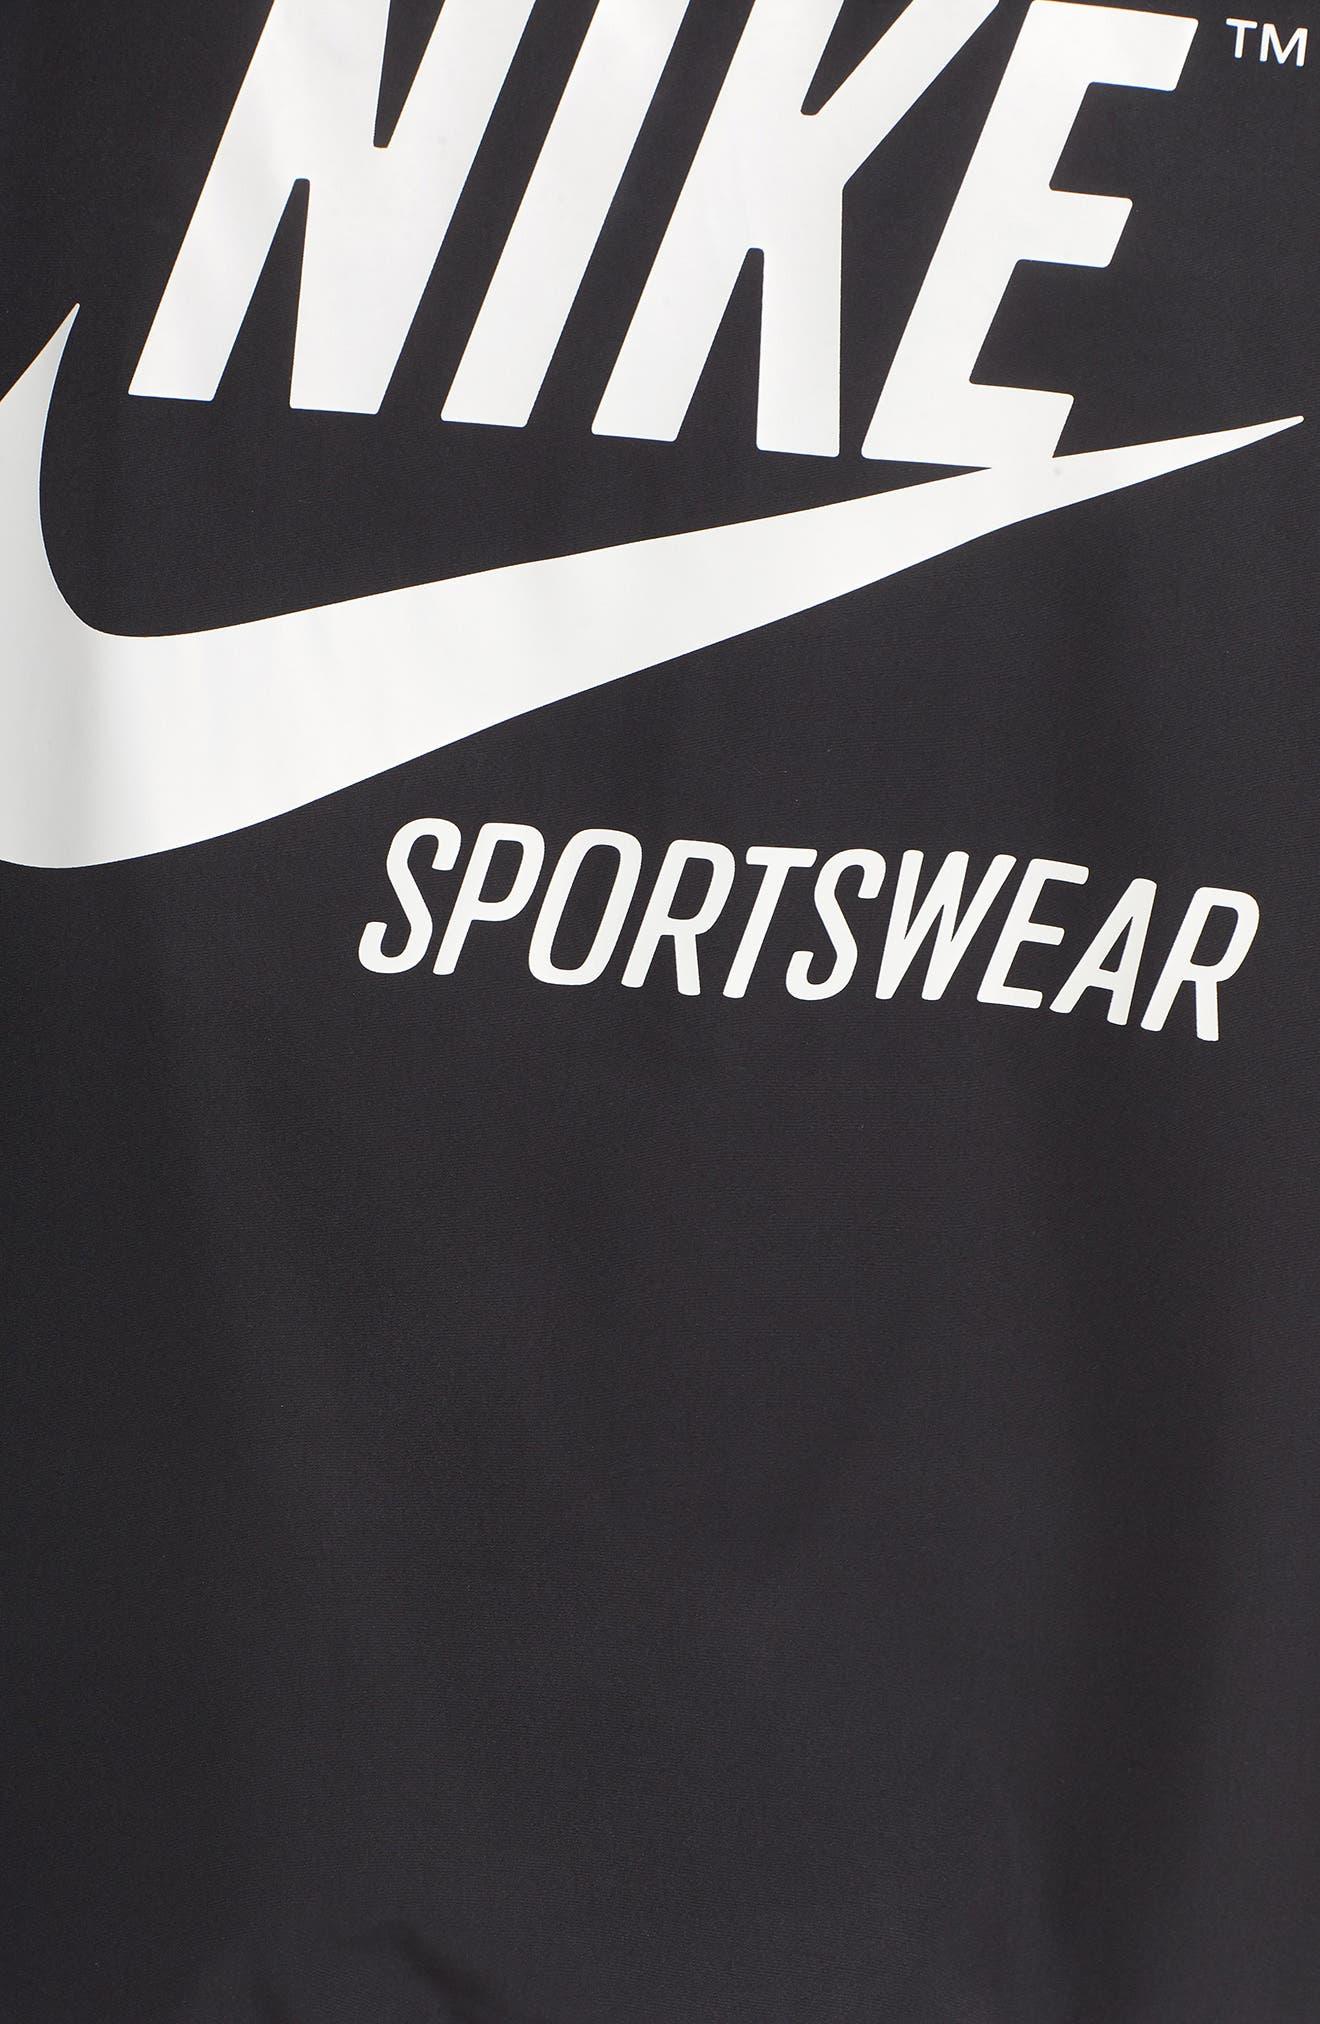 Sportswear Archive Jacket,                             Alternate thumbnail 6, color,                             Black/ Black